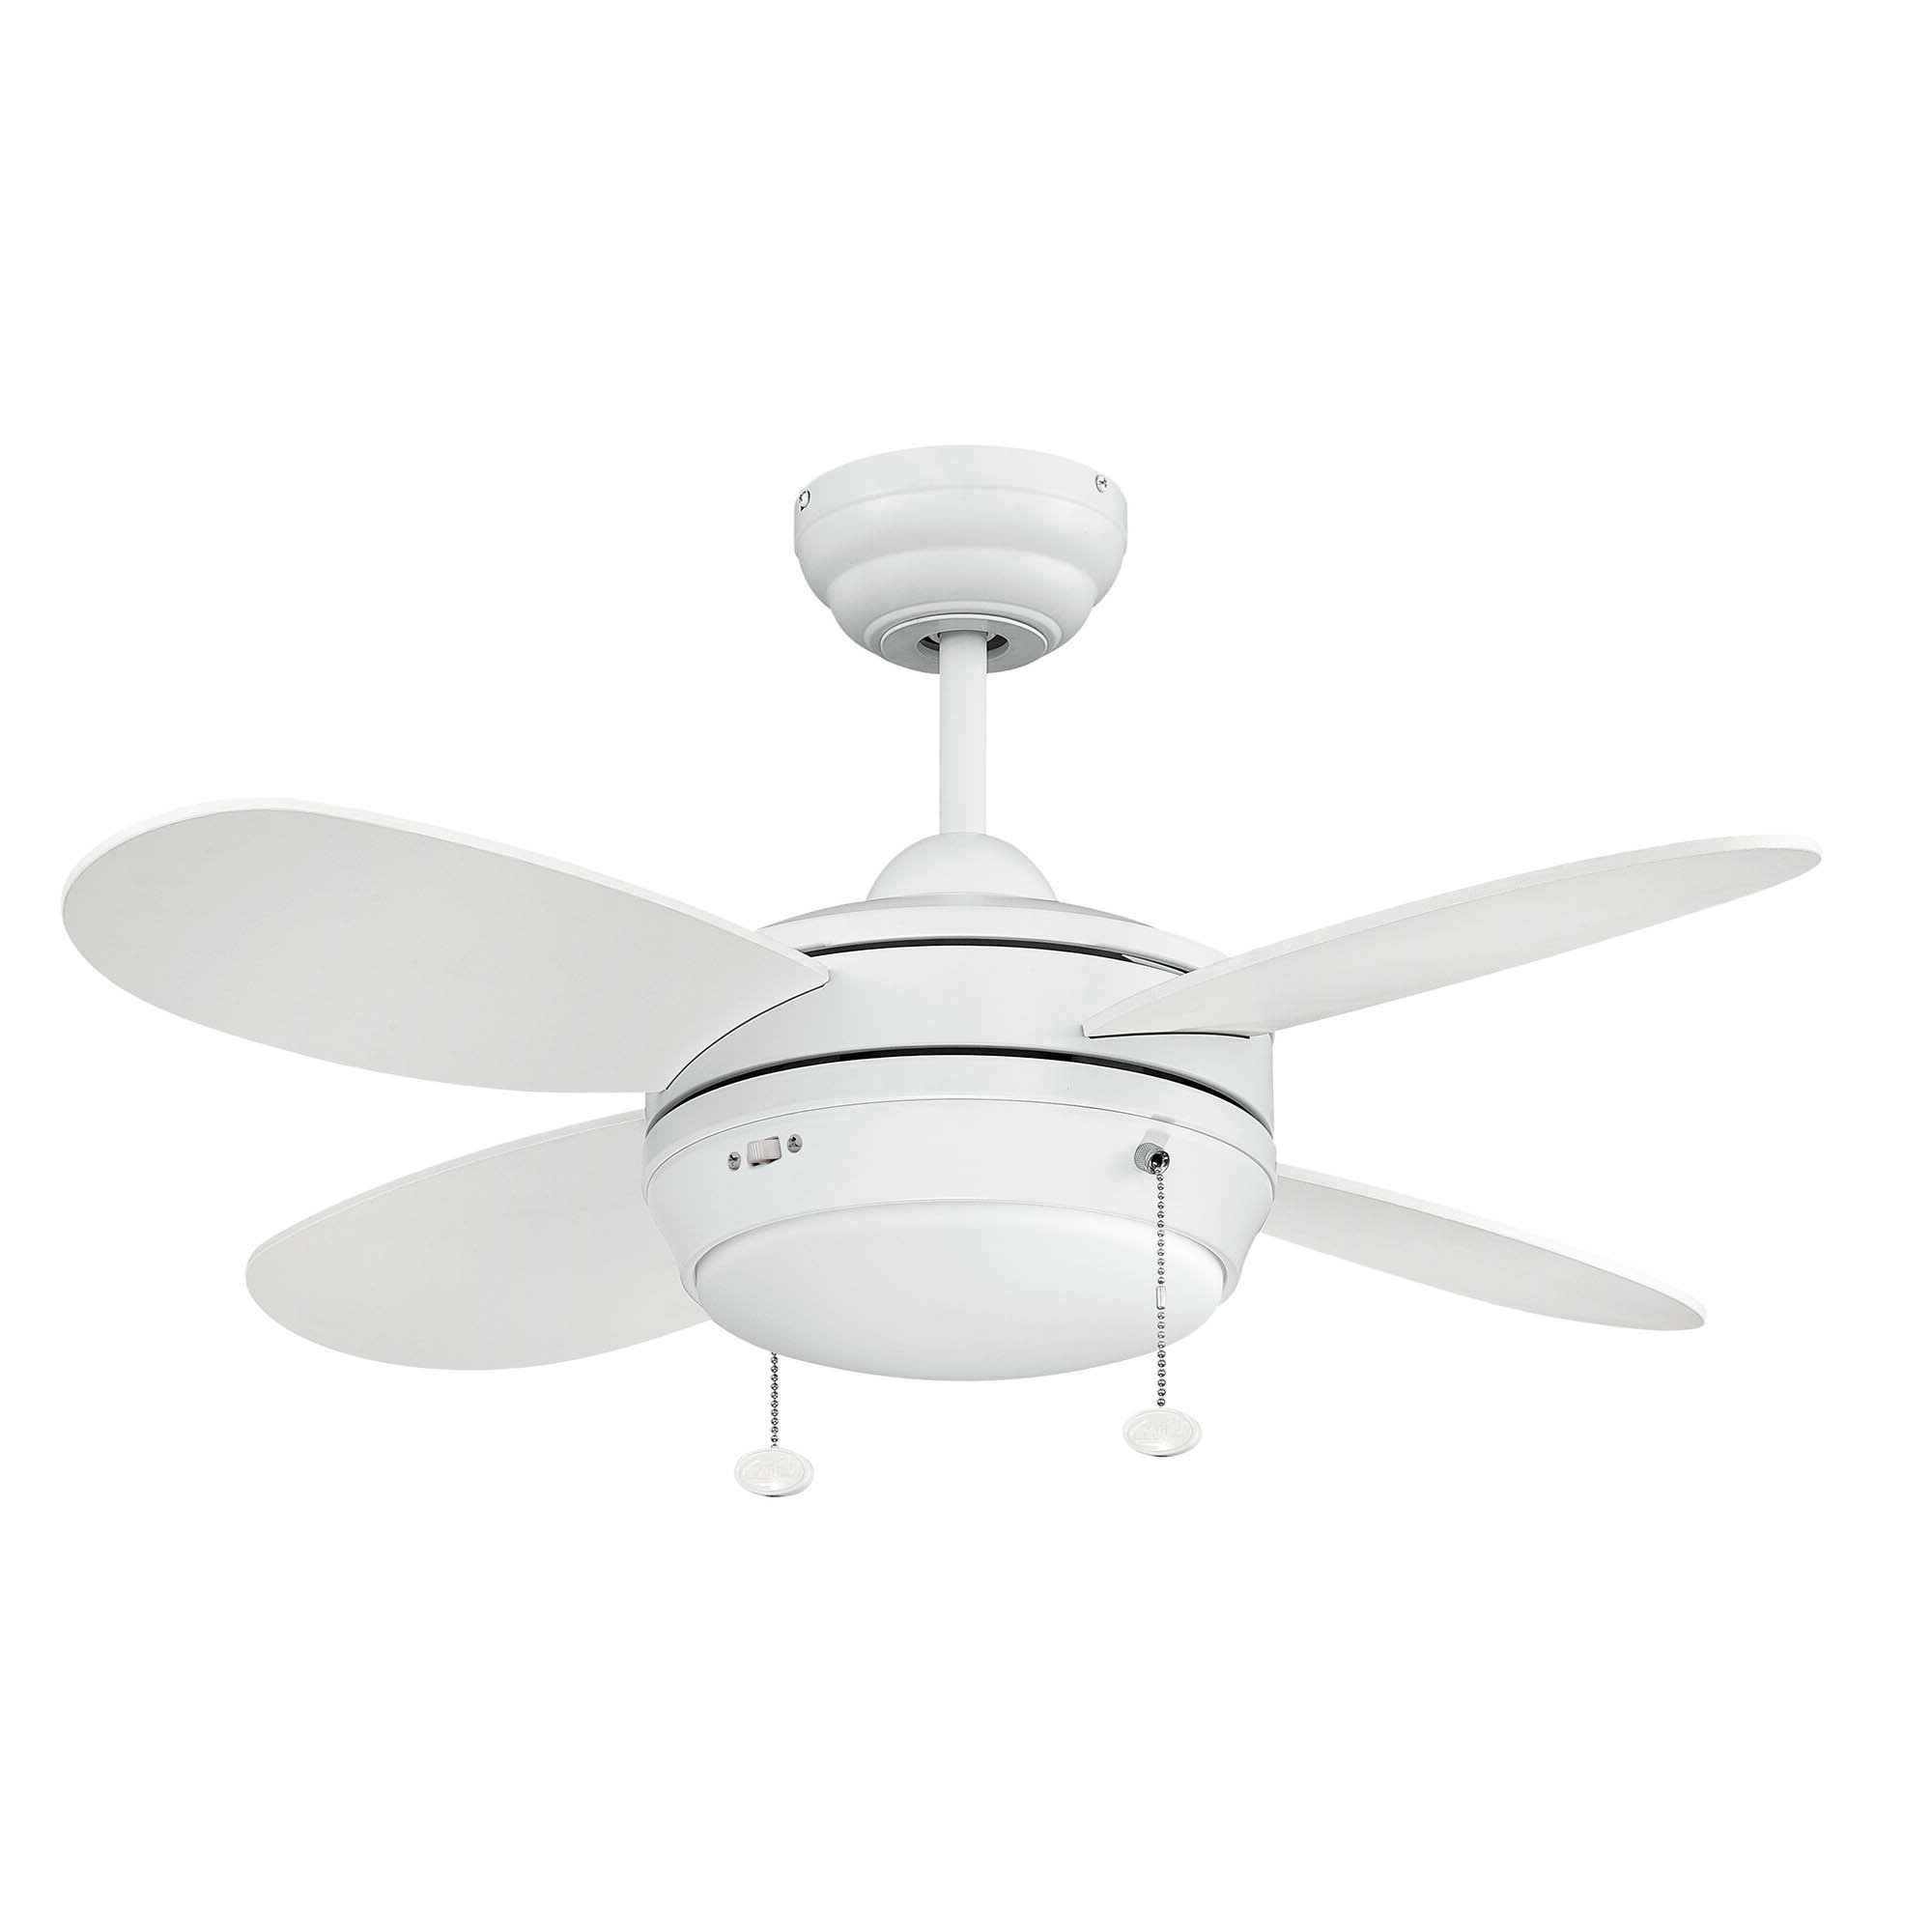 "36"" Kopnisky Dual Mount 4 Blade Ceiling Fan, Light Kit Included Intended For Popular Stewardson 4 Blade Ceiling Fans (View 3 of 20)"